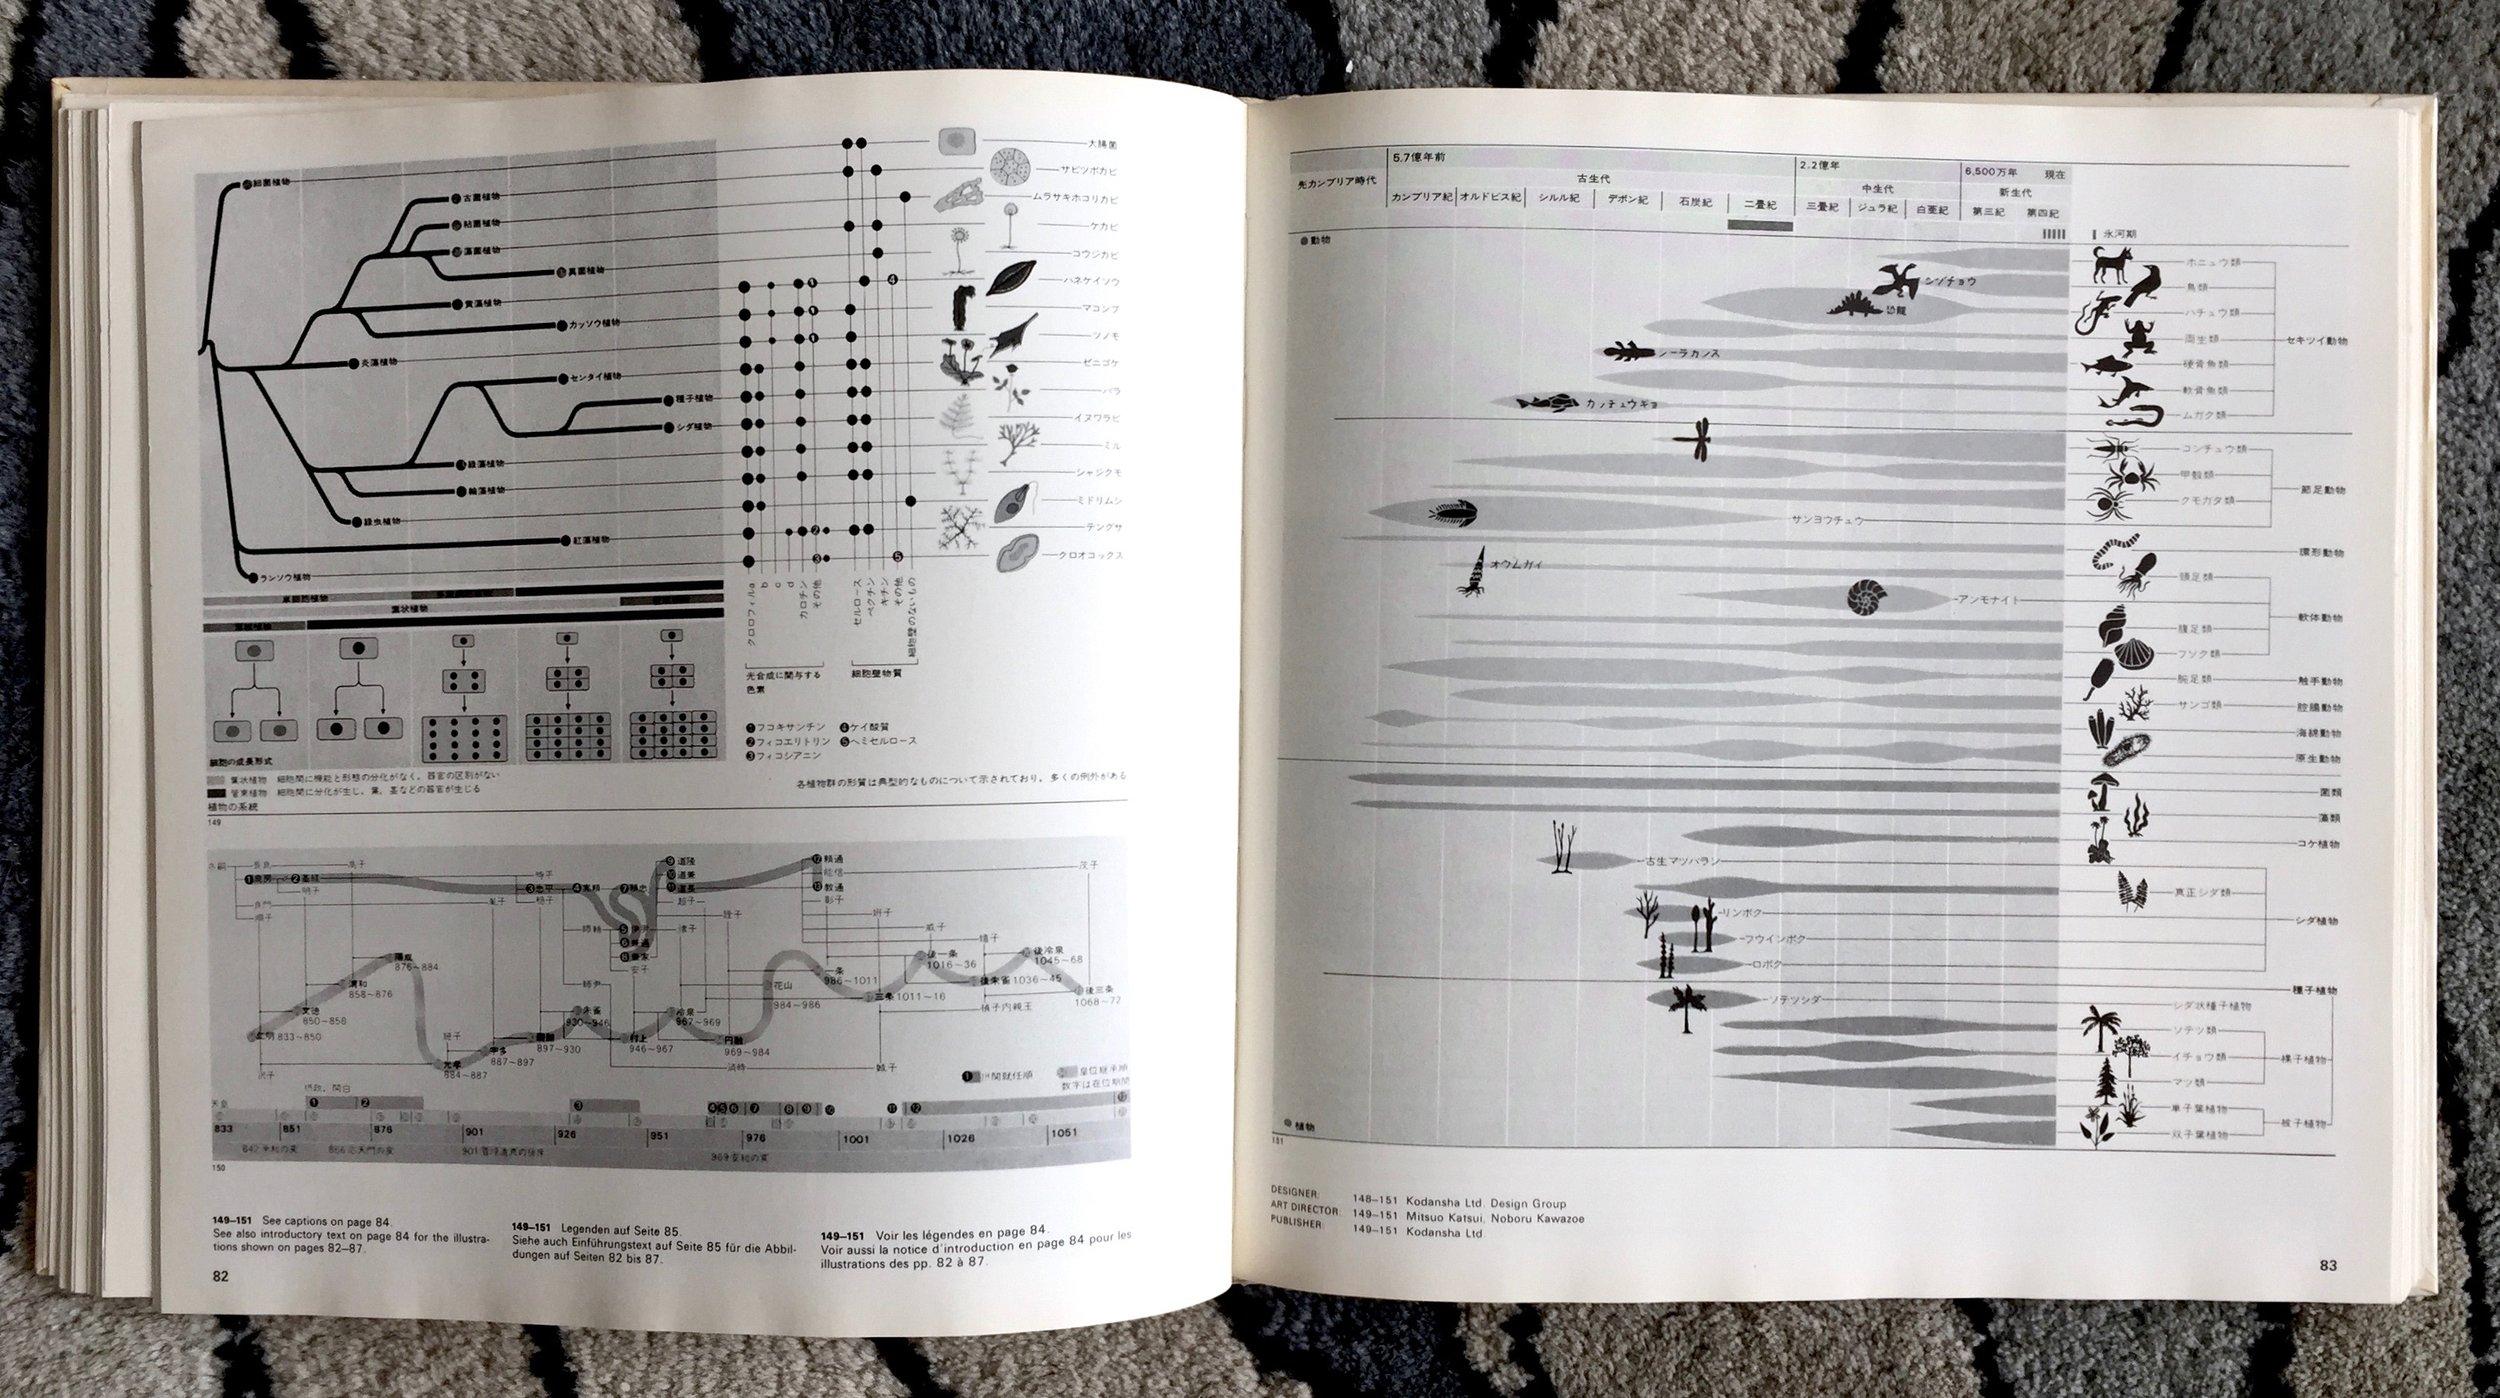 graphisdiagrams_spreads_5402.jpg